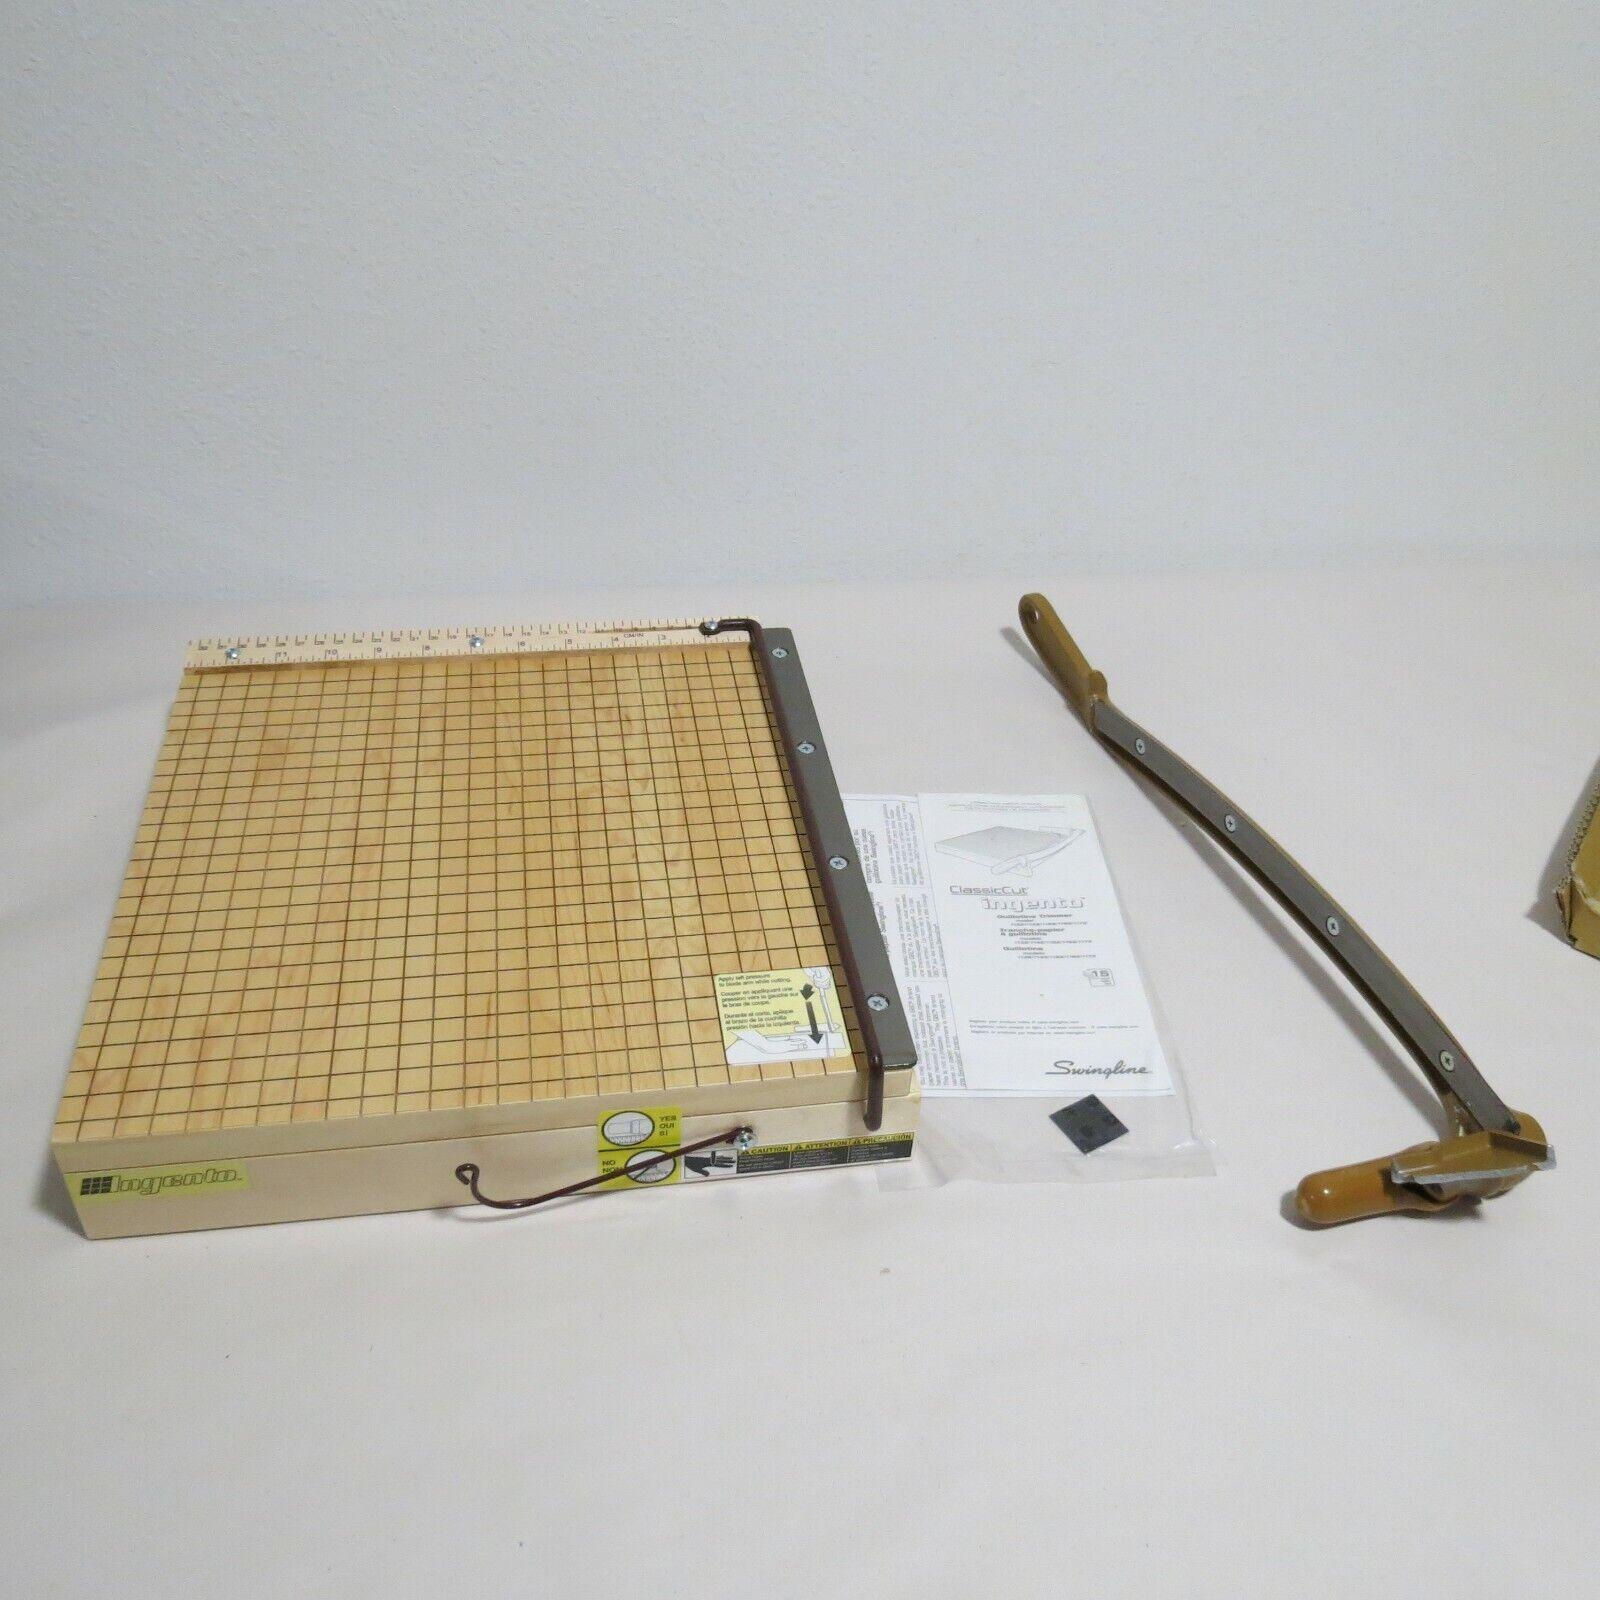 Swingline ClassicCut Ingento Guillotine Trimmer 12 inch  No. 1132A Parts Repair